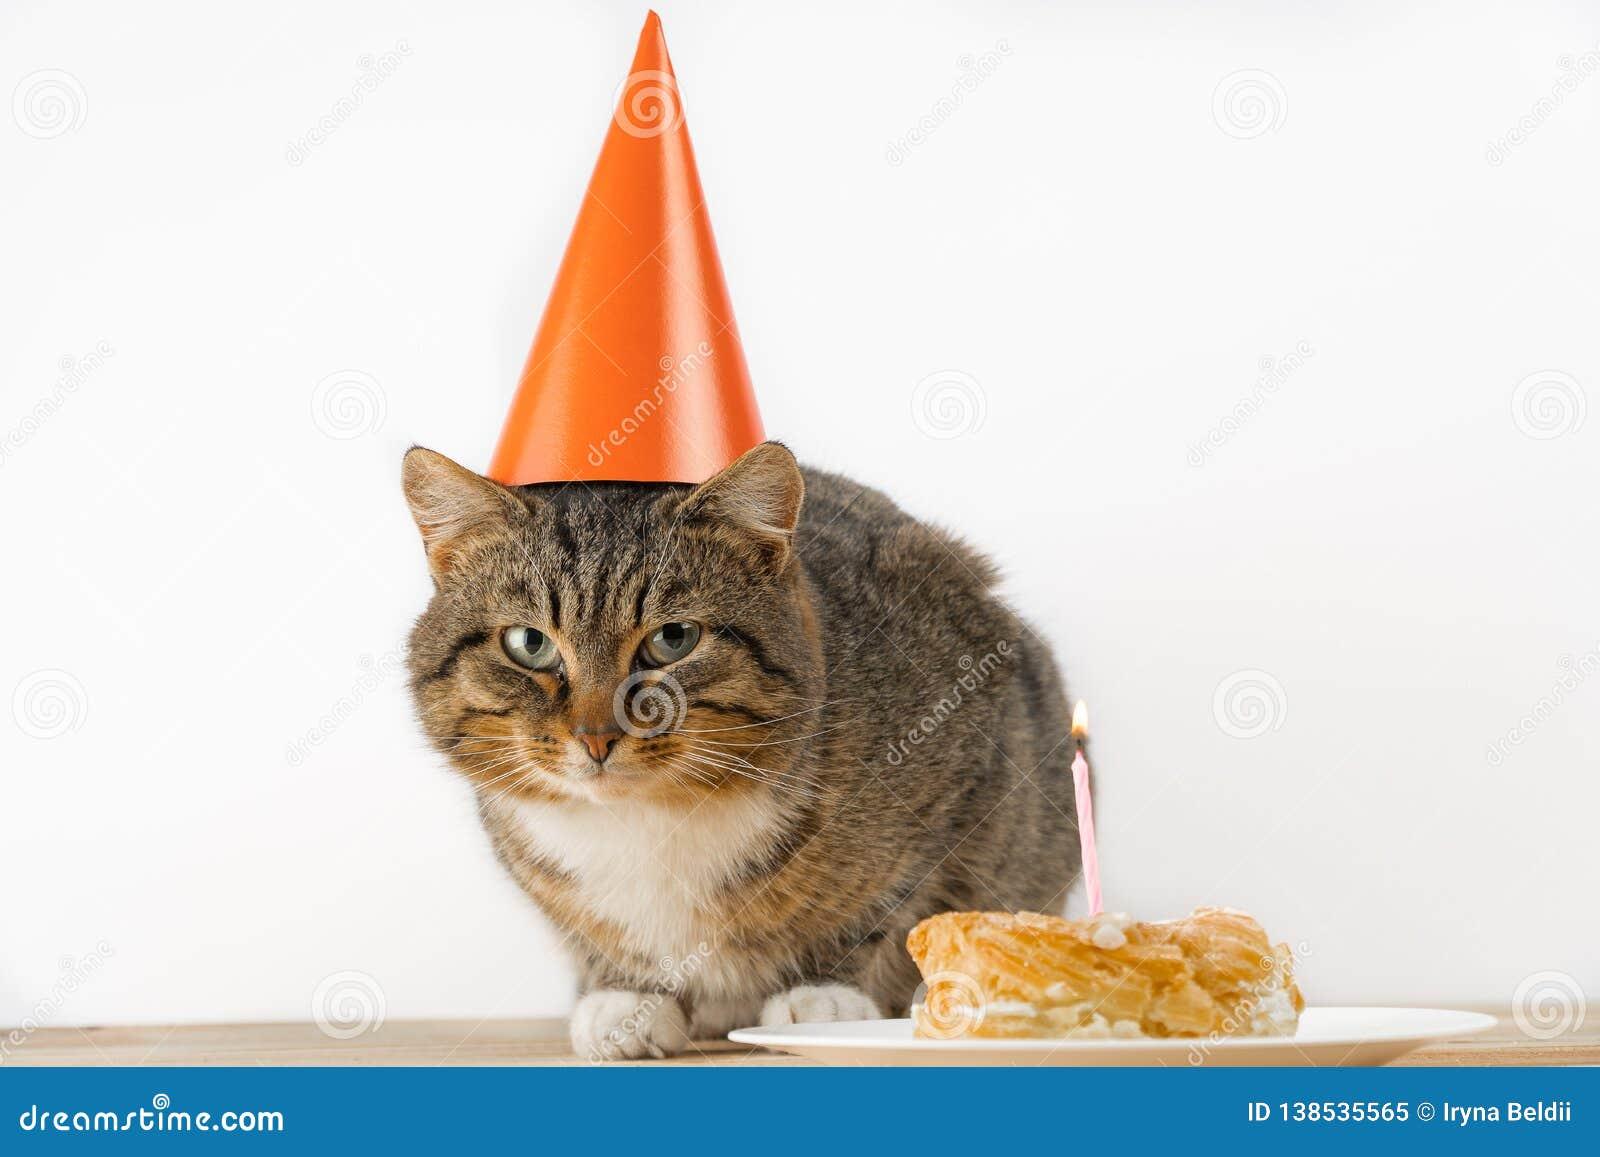 Awe Inspiring Cat Birthday Cake Cat In A Festive Hat Stock Image Image Of Personalised Birthday Cards Epsylily Jamesorg